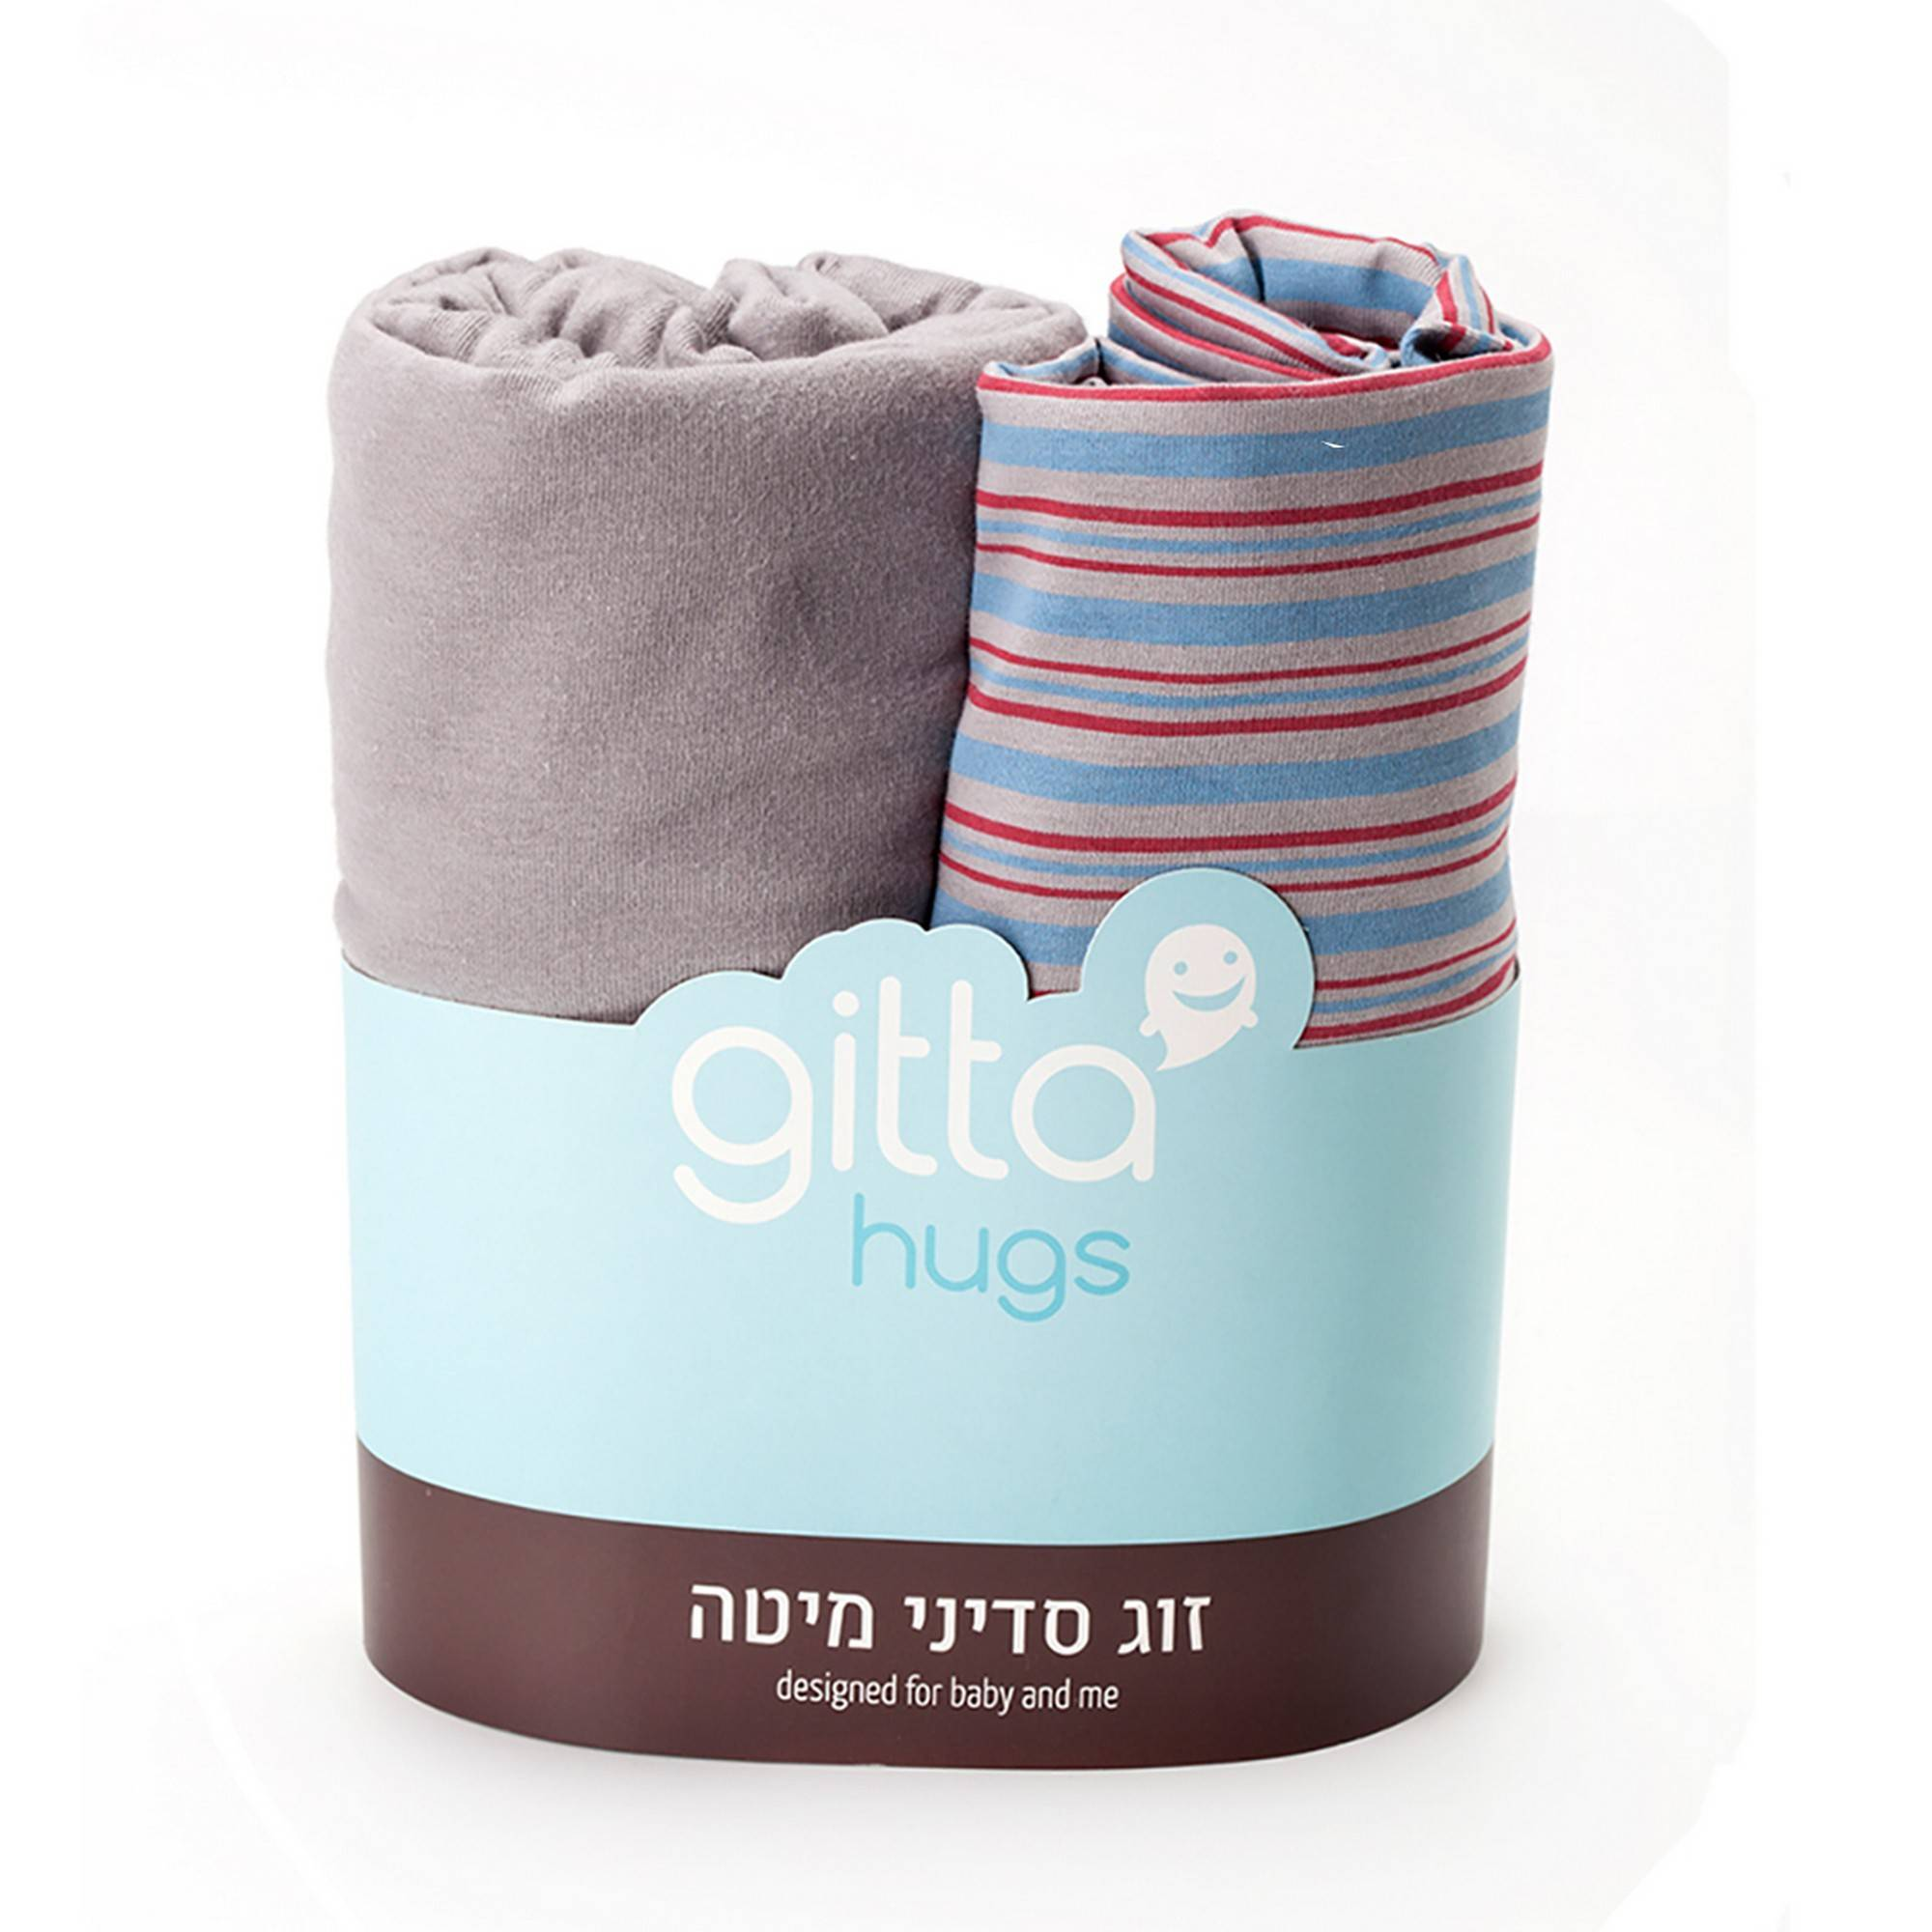 GITTA Cot Sheets - Grey Stripes